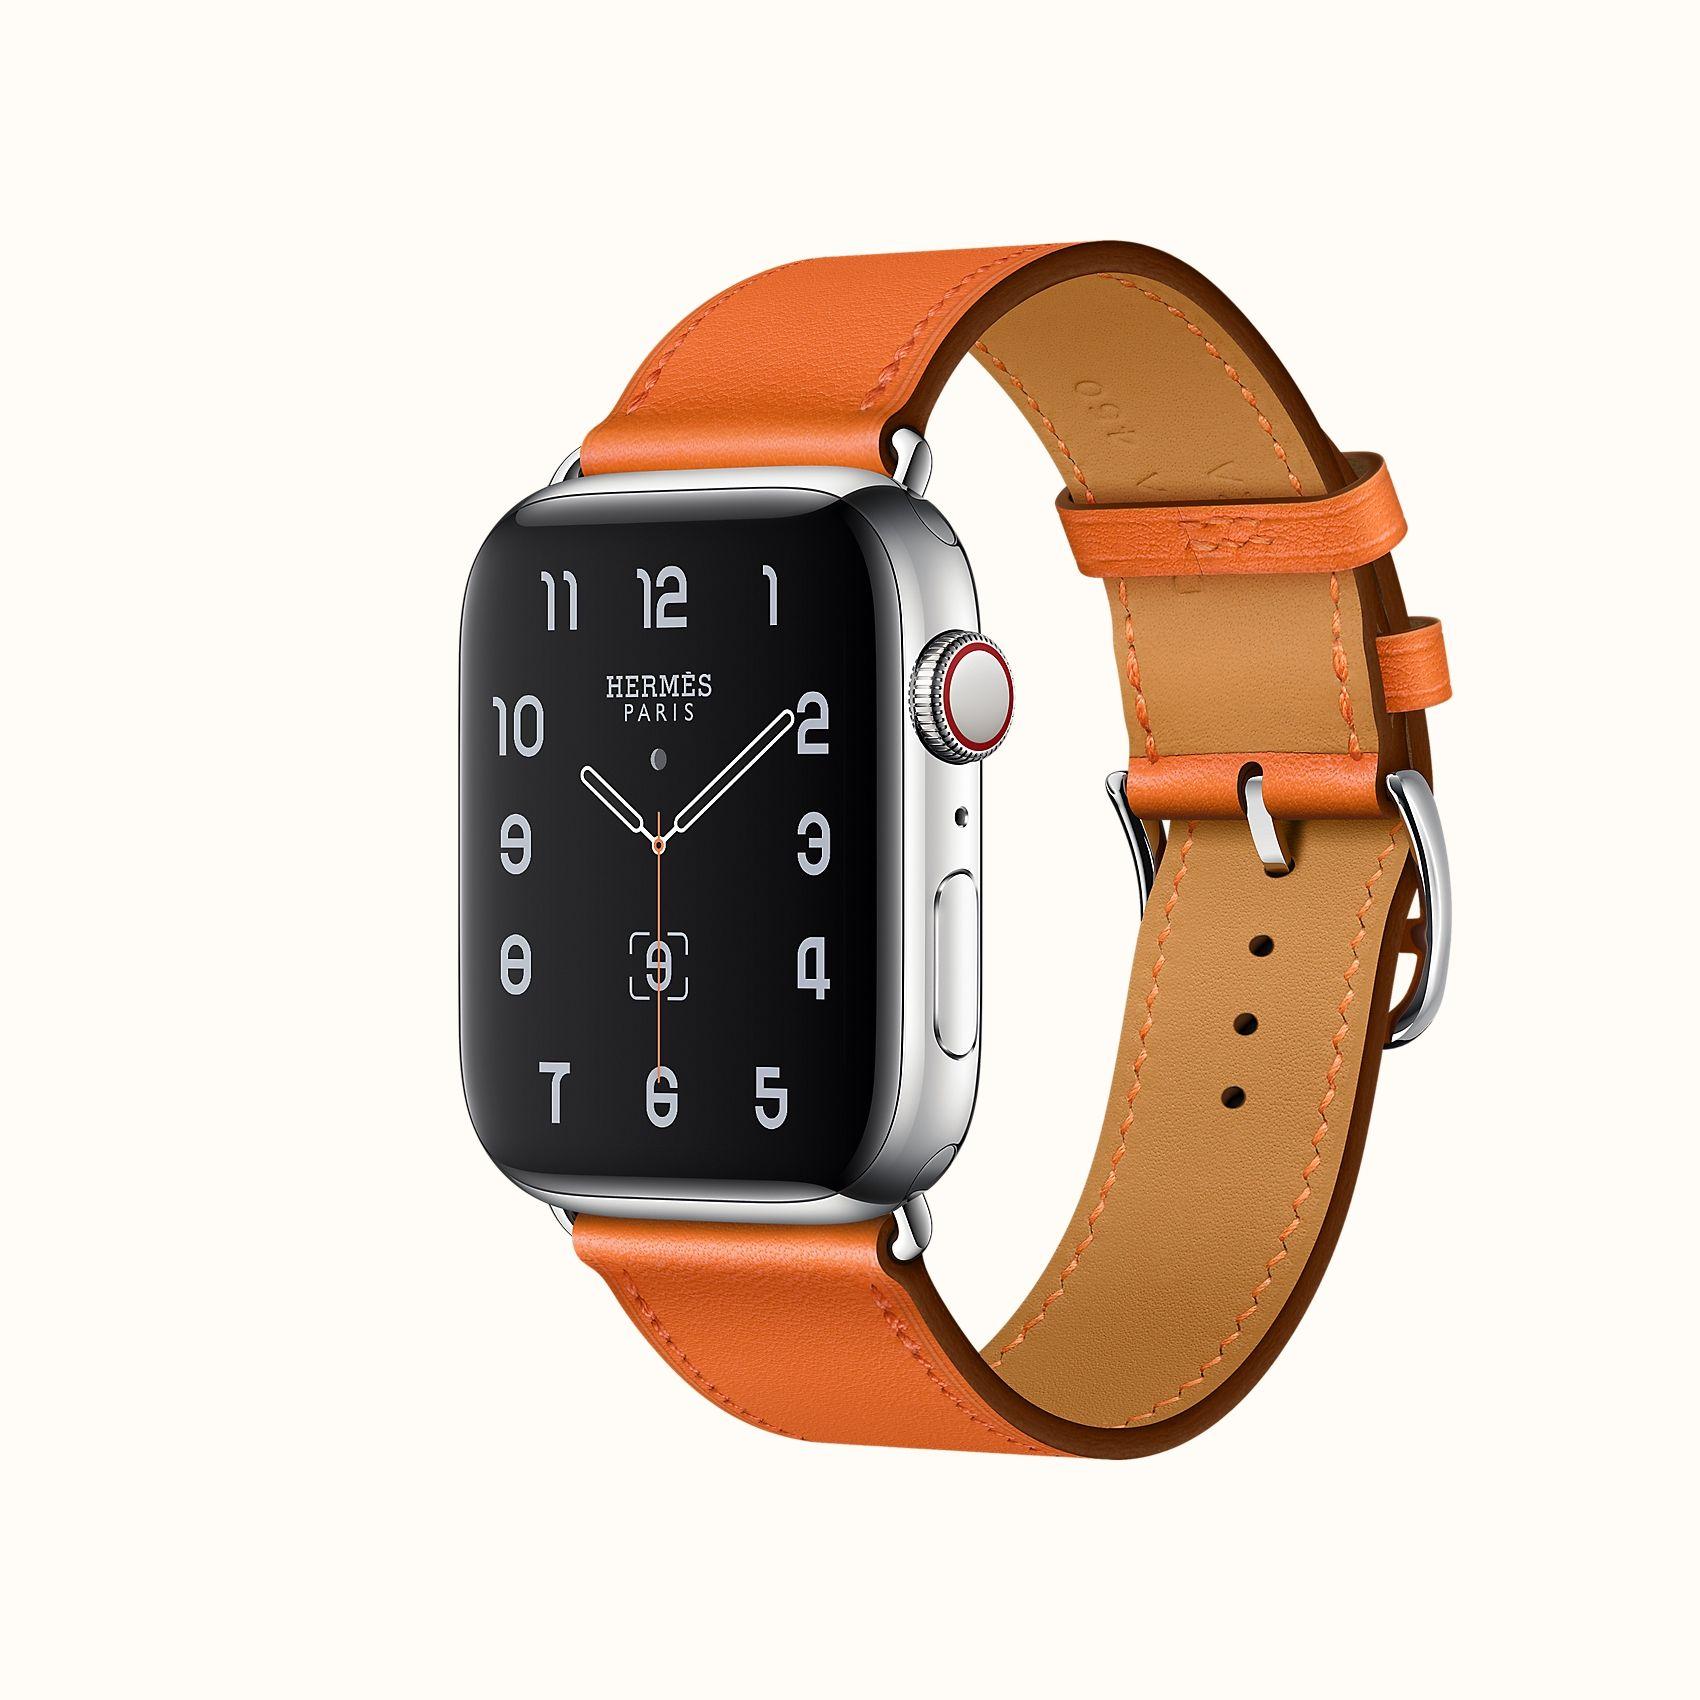 Series 5 Case Band Apple Watch Hermes Single Tour 44 Mm Deployment Buckle Buy Apple Watch Apple Watch Hermes Apple Watch